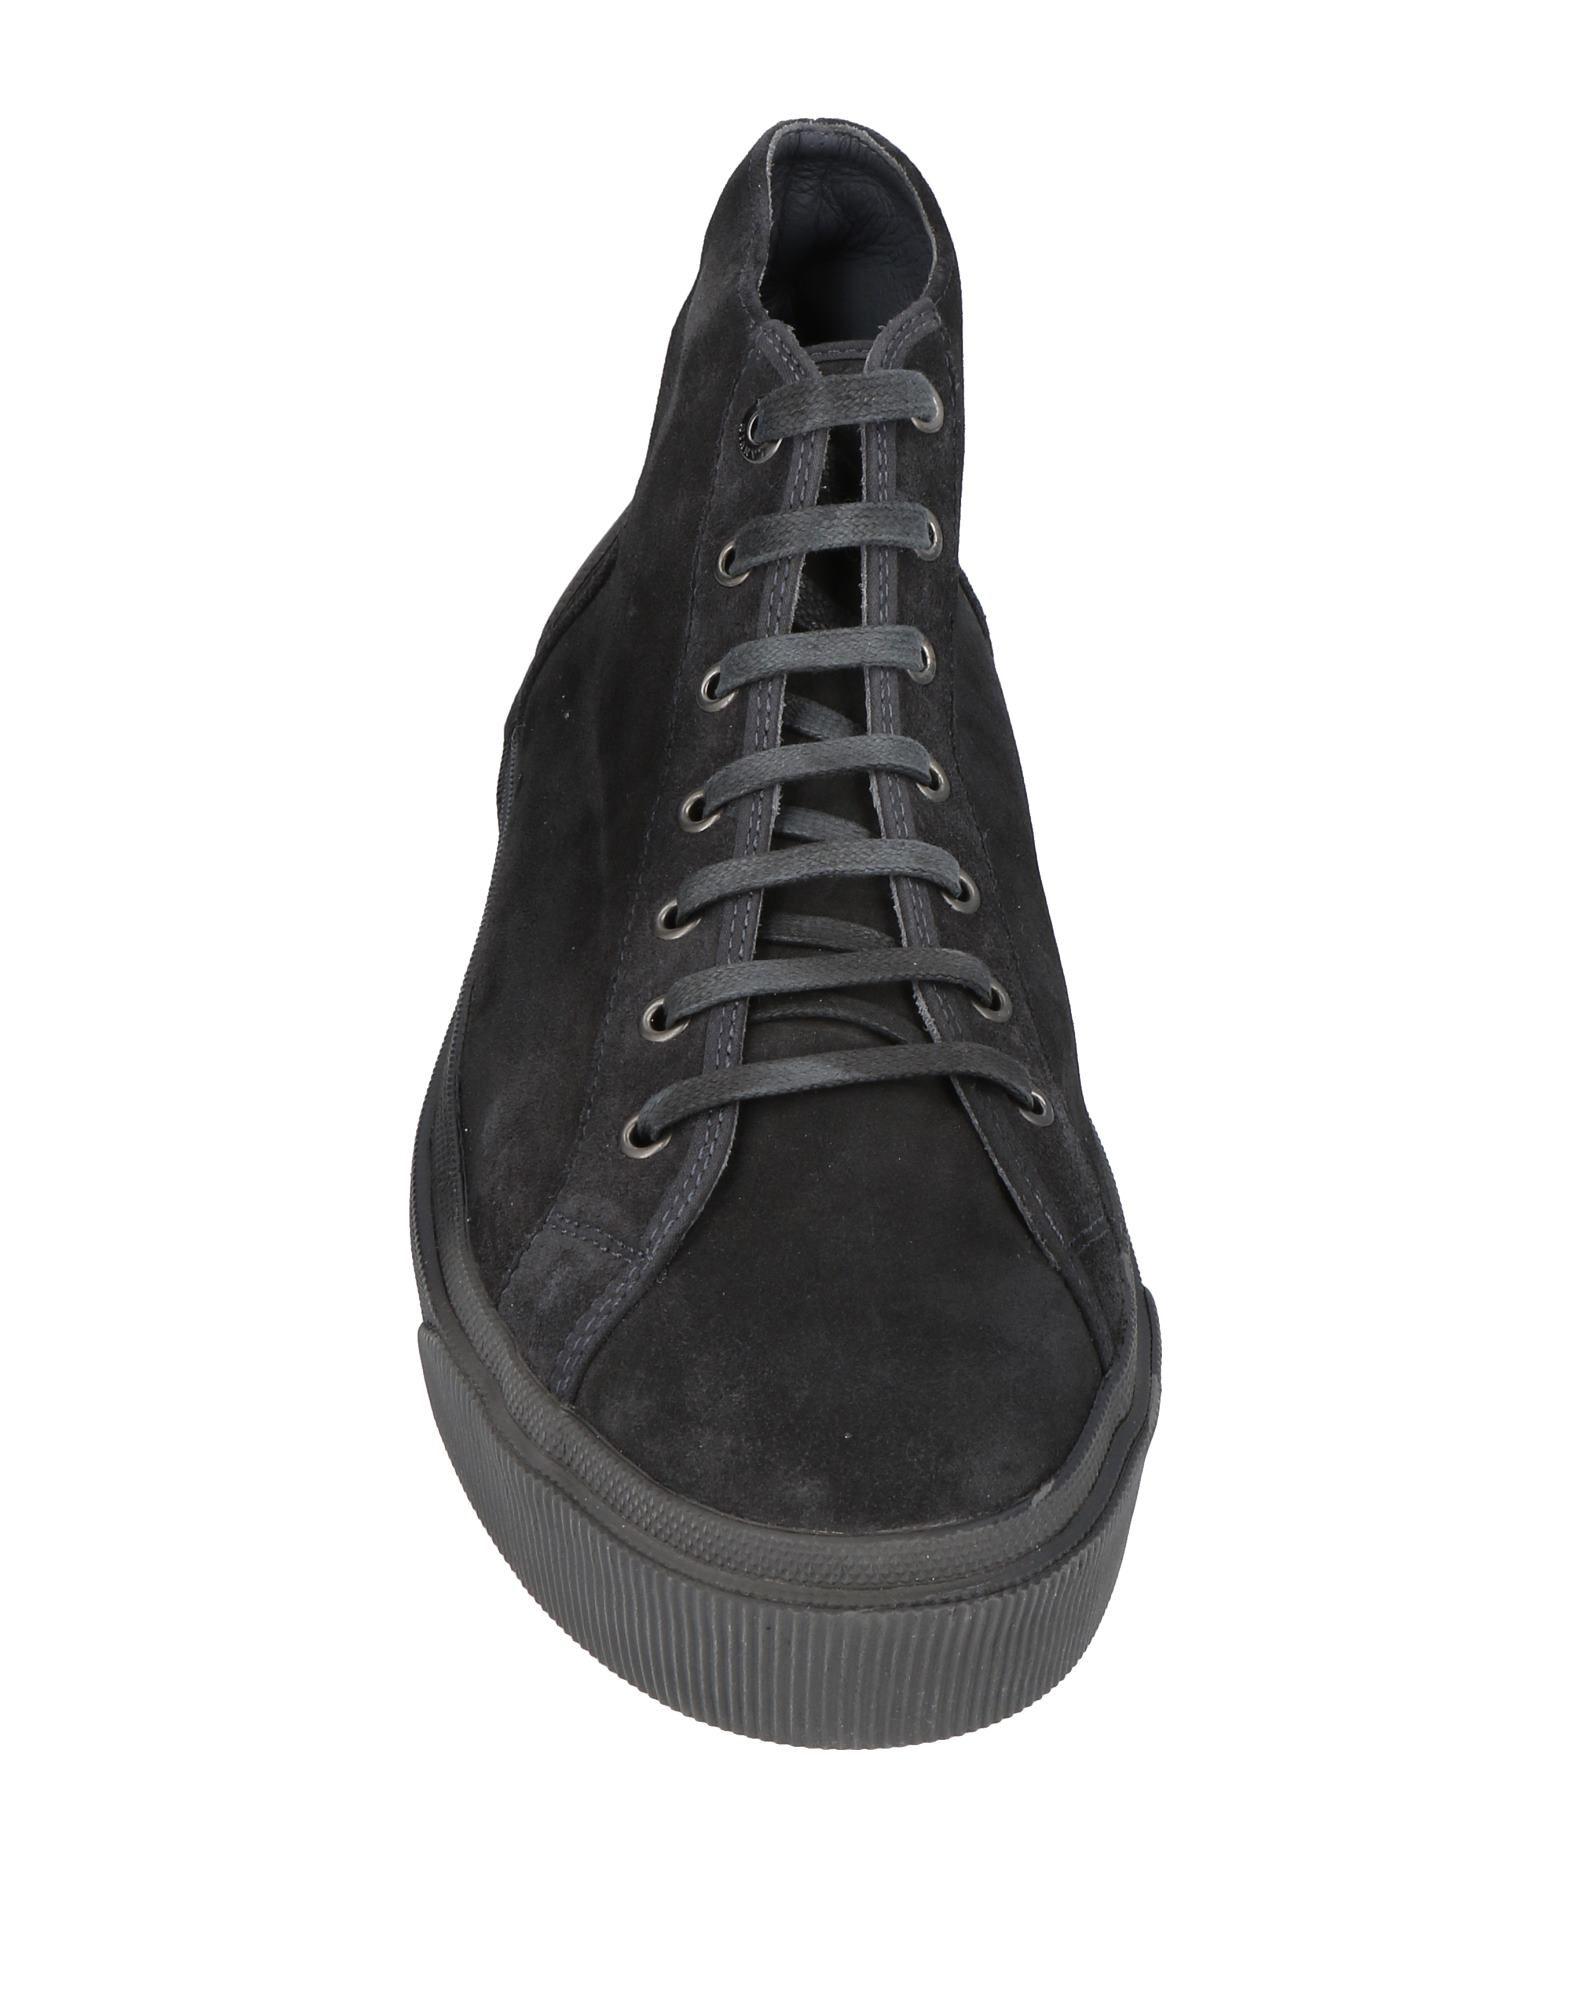 Lanvin Sneakers Herren  Schuhe 11463781CV Gute Qualität beliebte Schuhe  455302